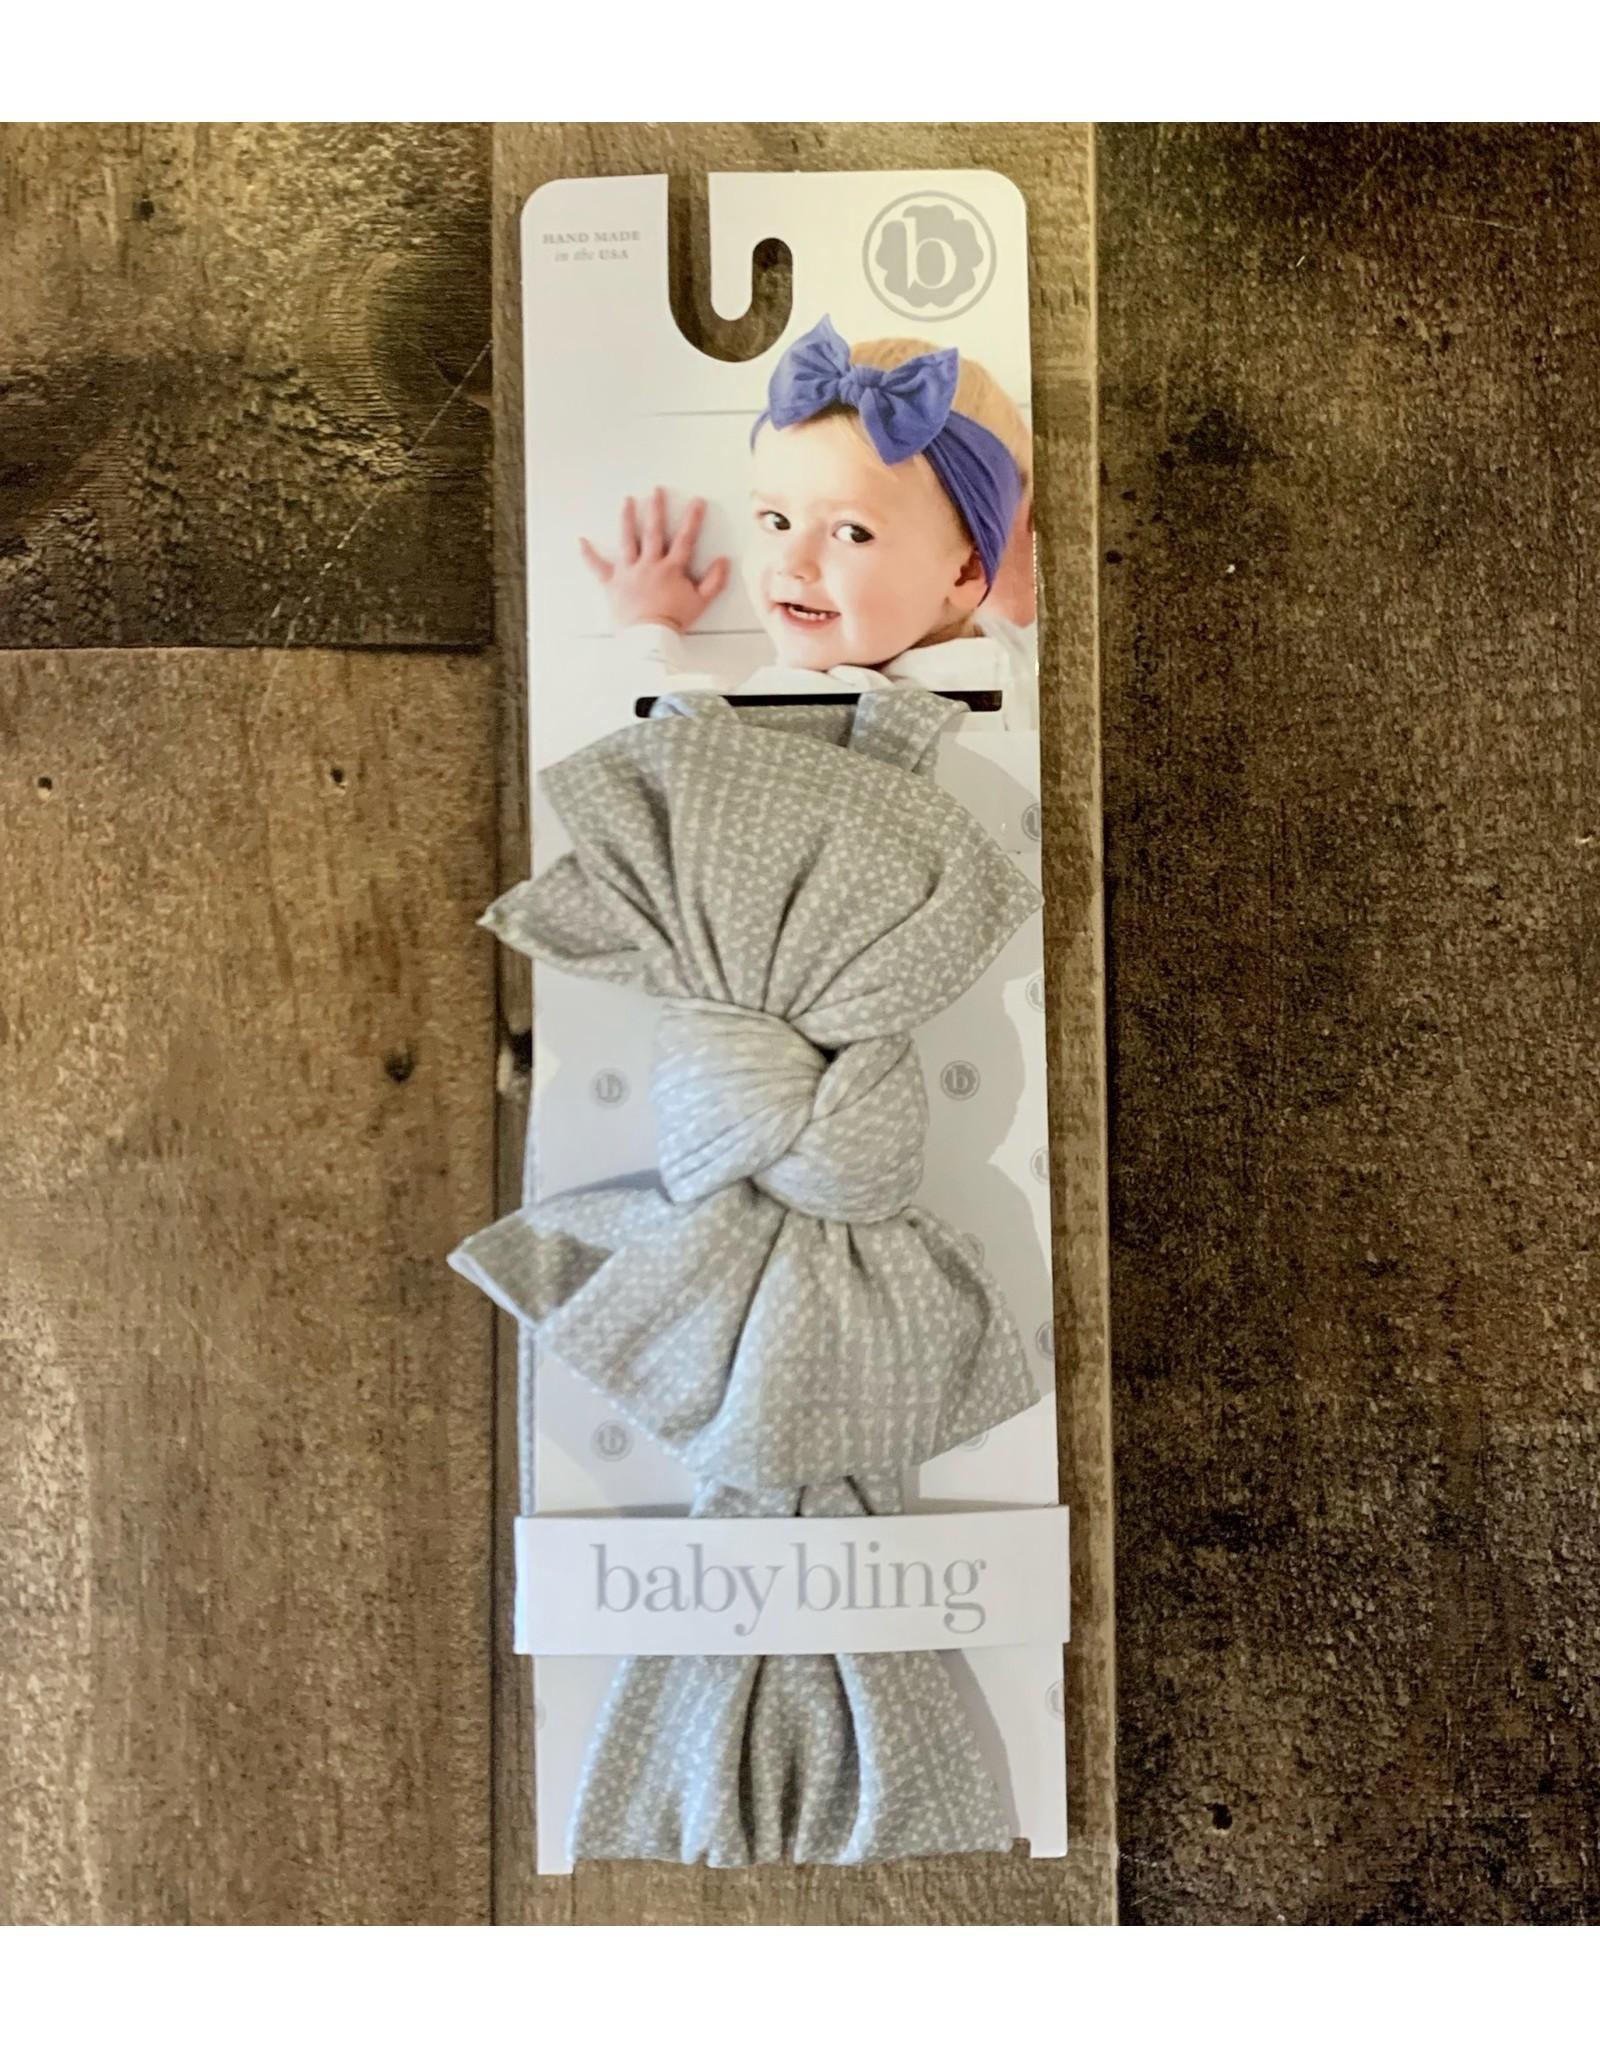 Baby Bling Baby Bling - Printed DEB Natural Grid Willow